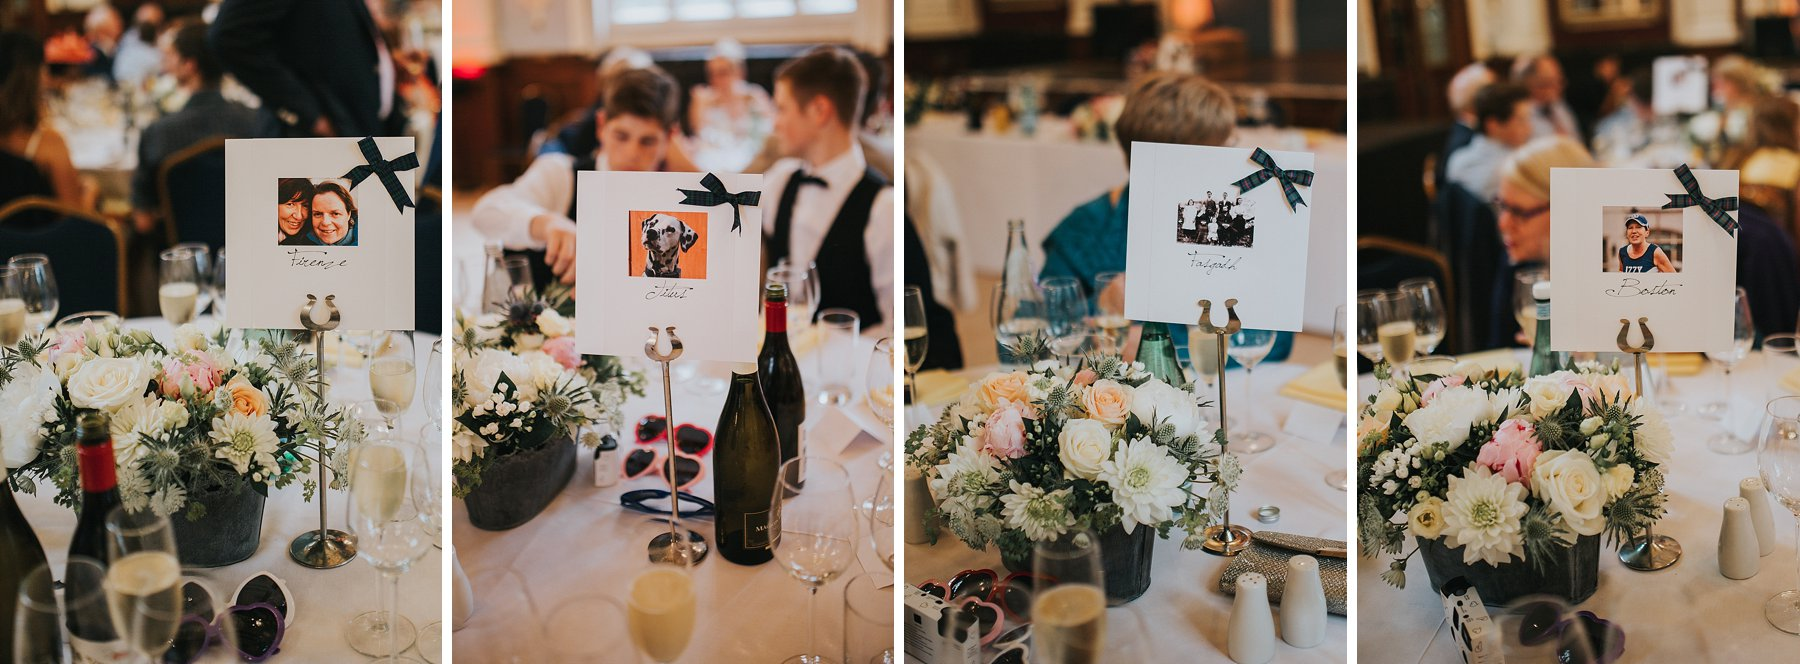 213-Old Finsbury Town Hall wedding.jpg